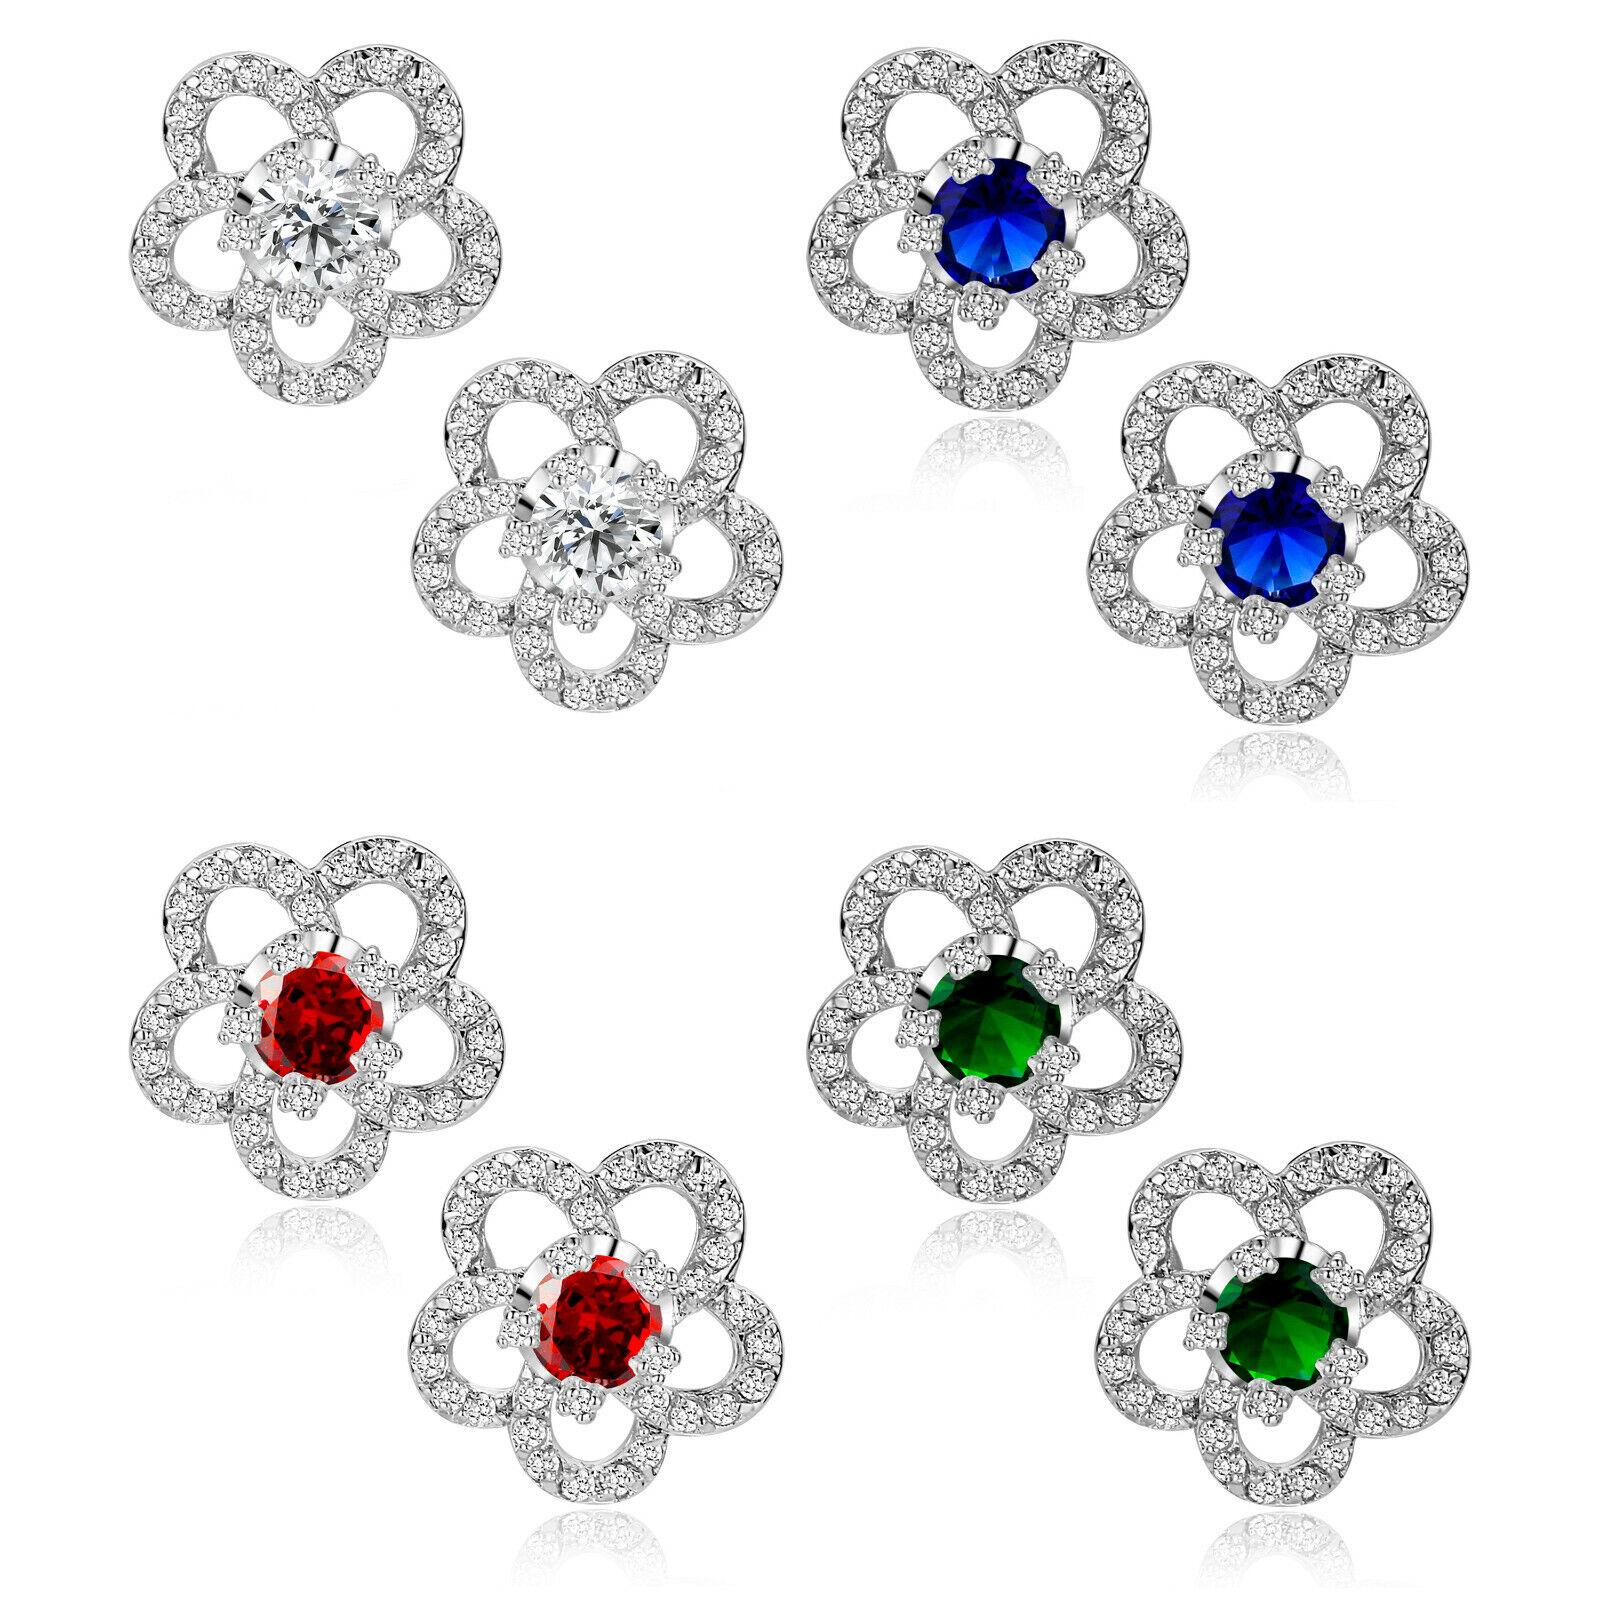 Womens Flower Cubic Zirconia & Austrian Crystal White Gold Plated Stud Earrings Earrings